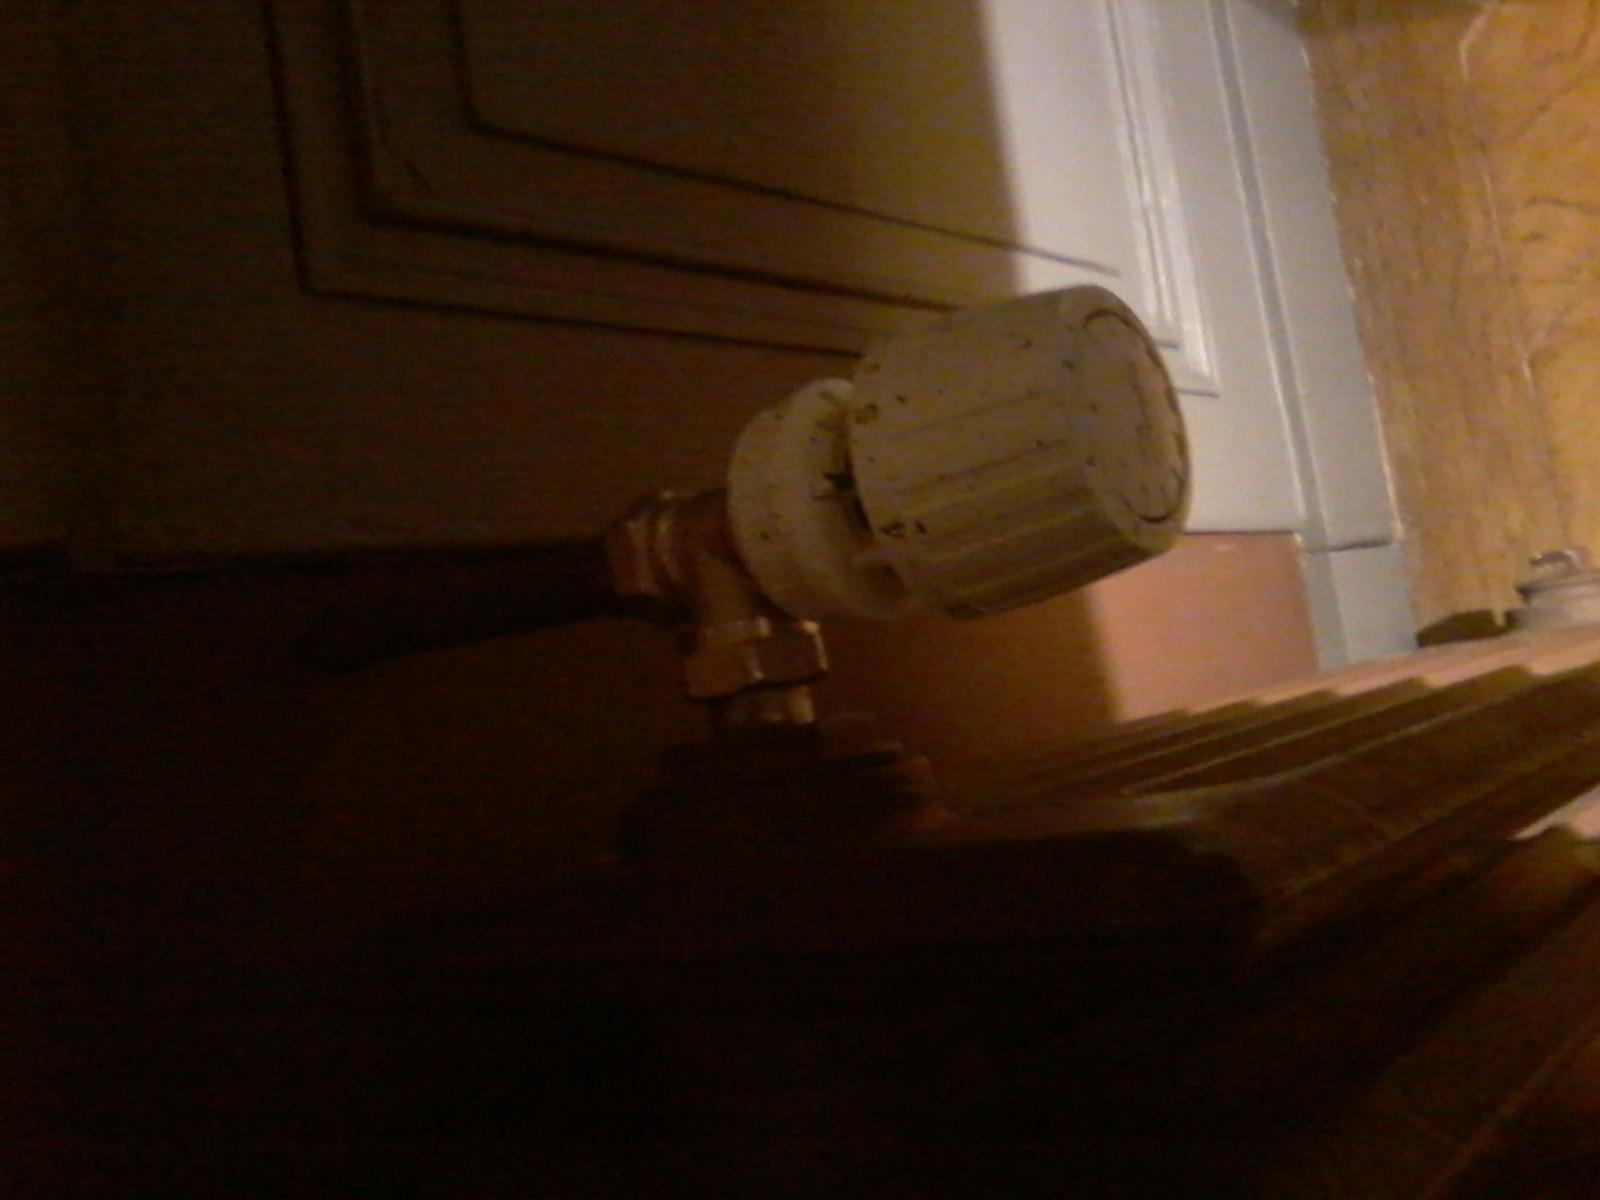 purge vieux radiateur fonte. Black Bedroom Furniture Sets. Home Design Ideas